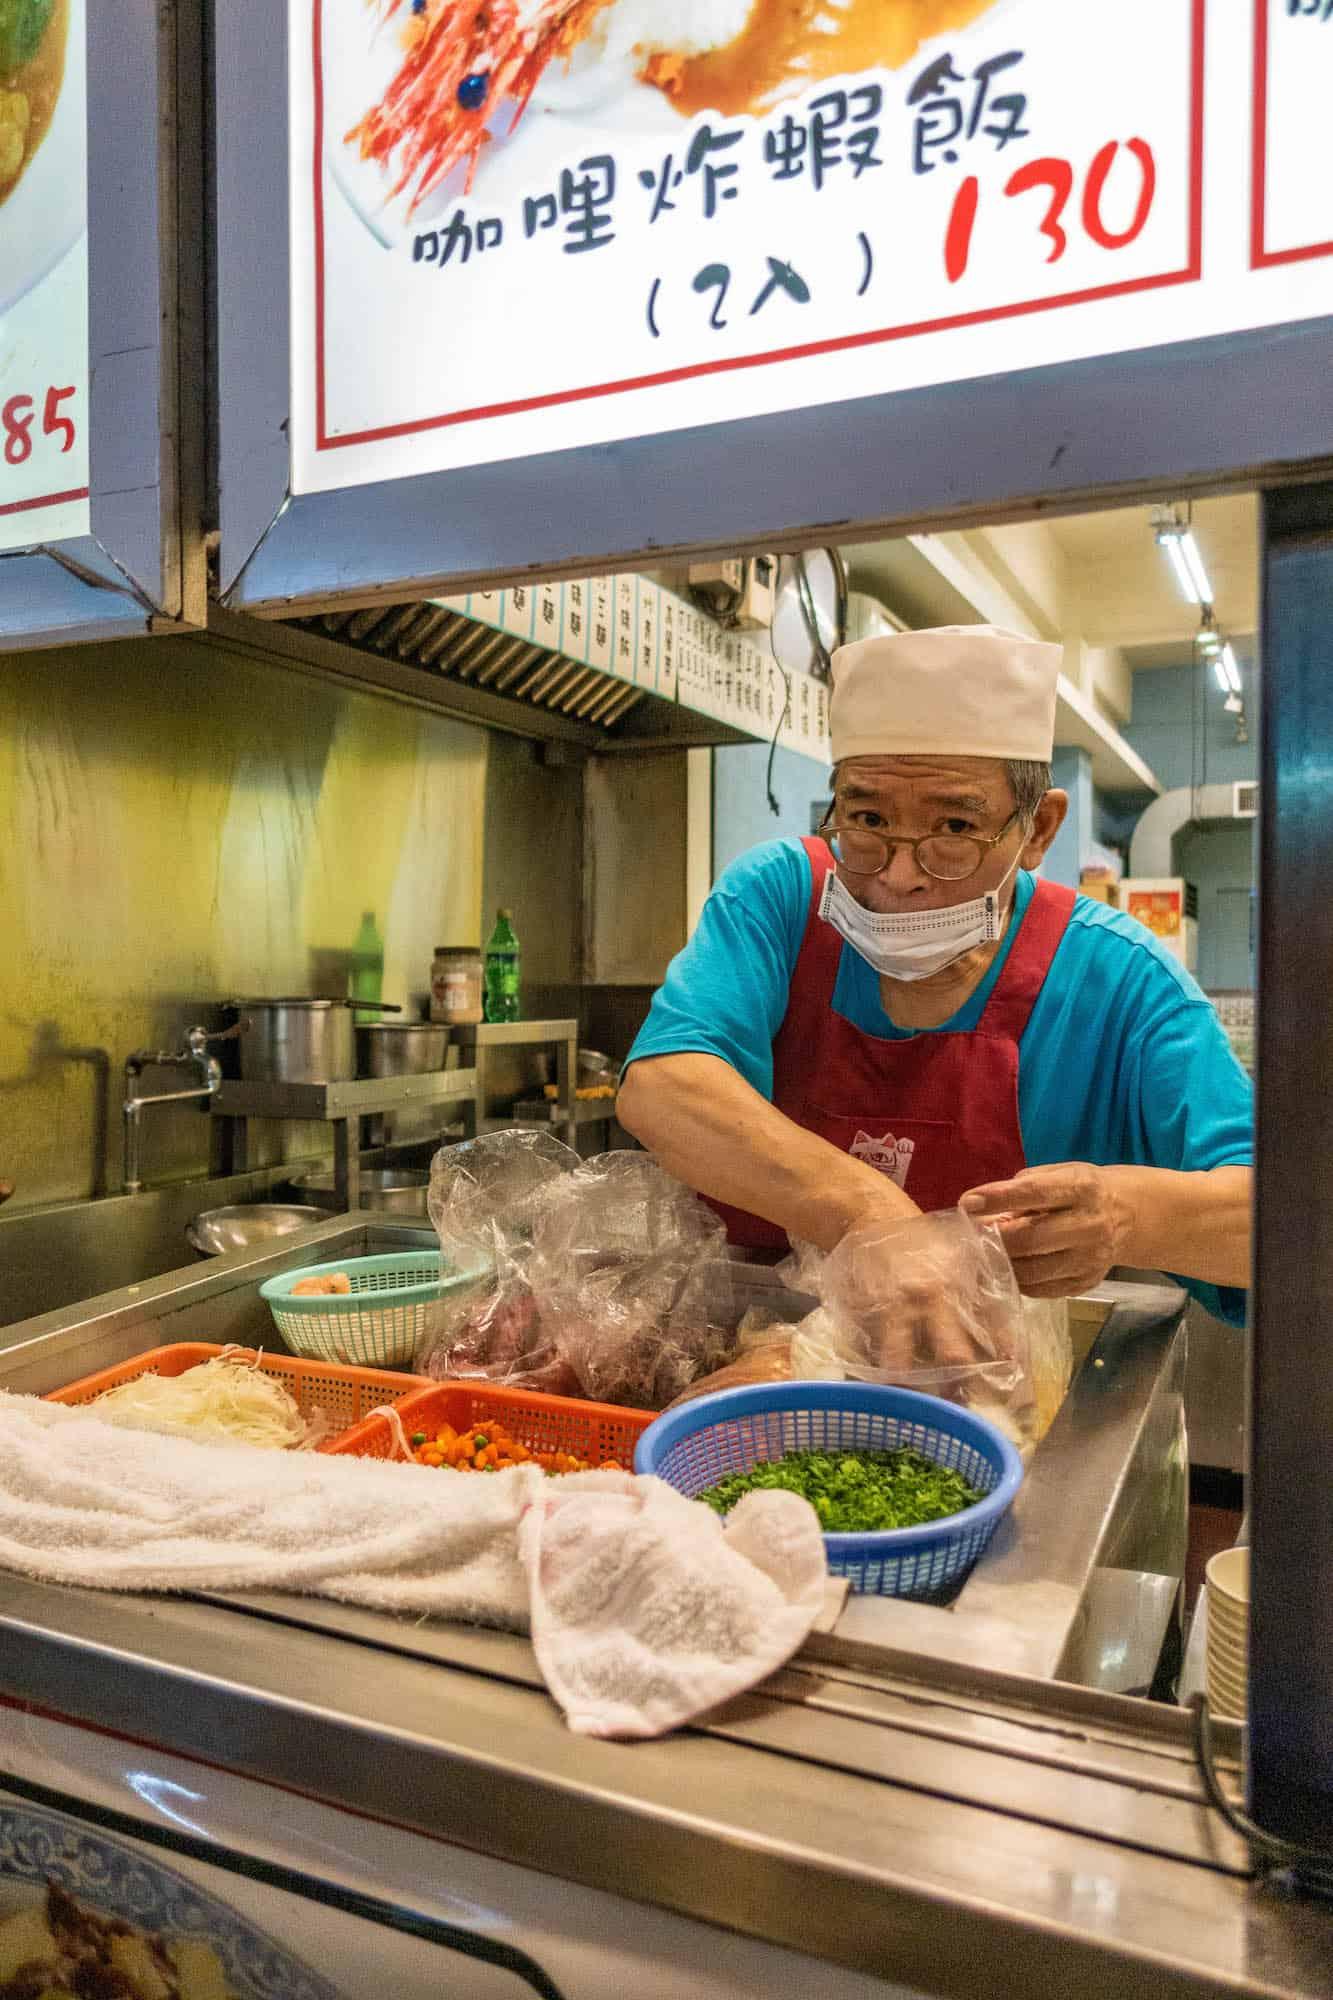 Taiwan Travel - Night Market - Cook